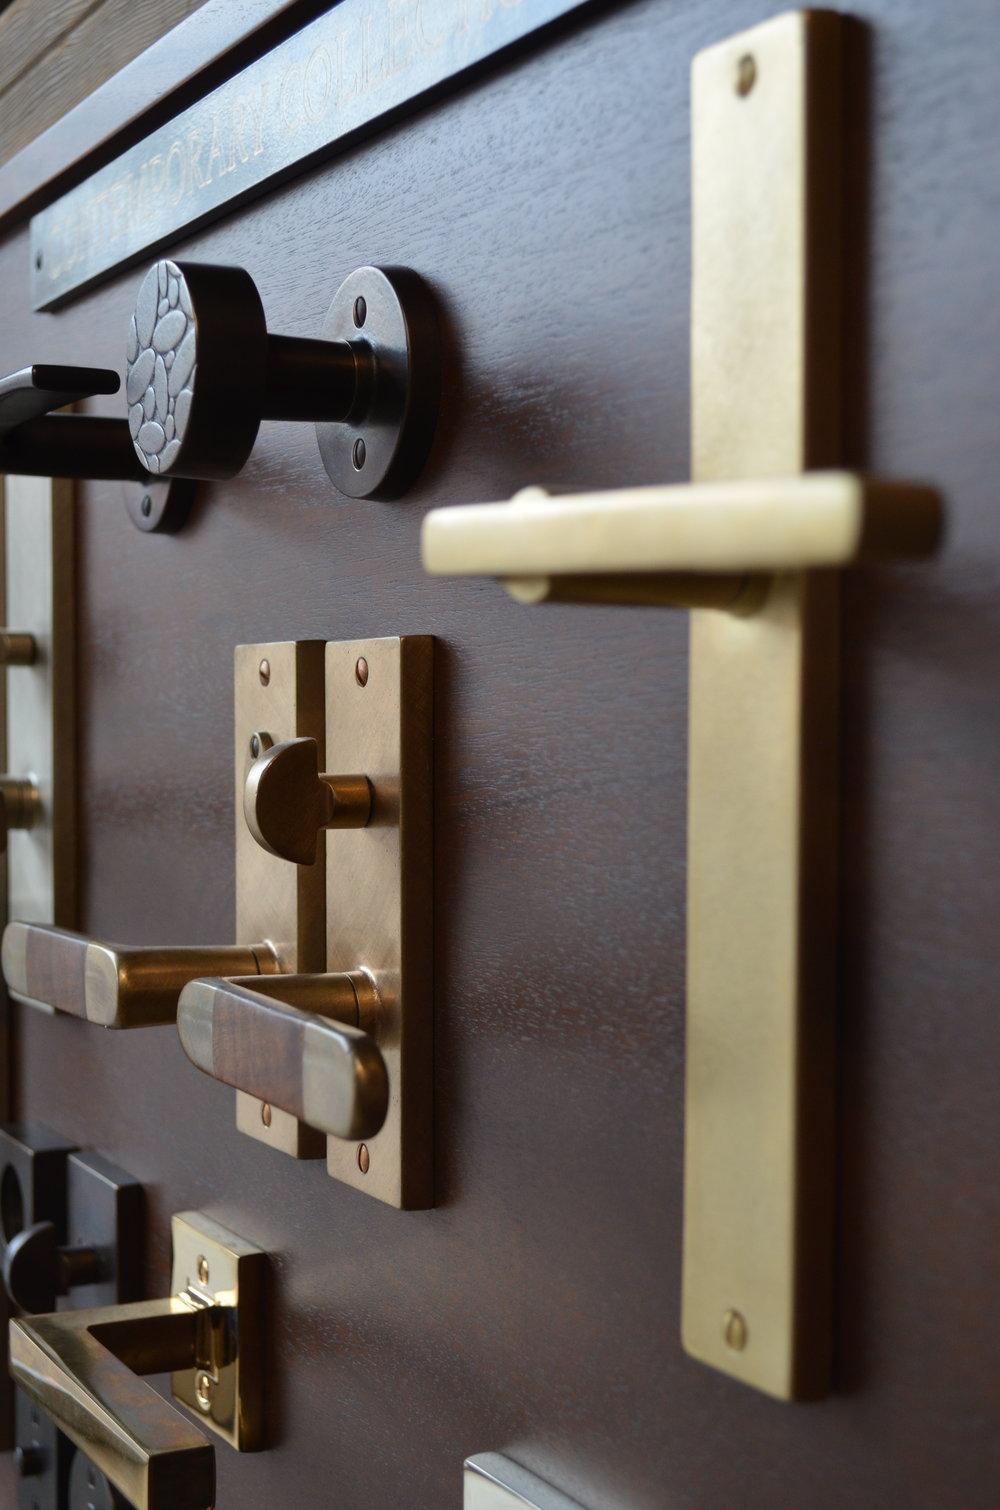 push door handles. push door handles & Push Door Handles Push Door Handles - Effte.co